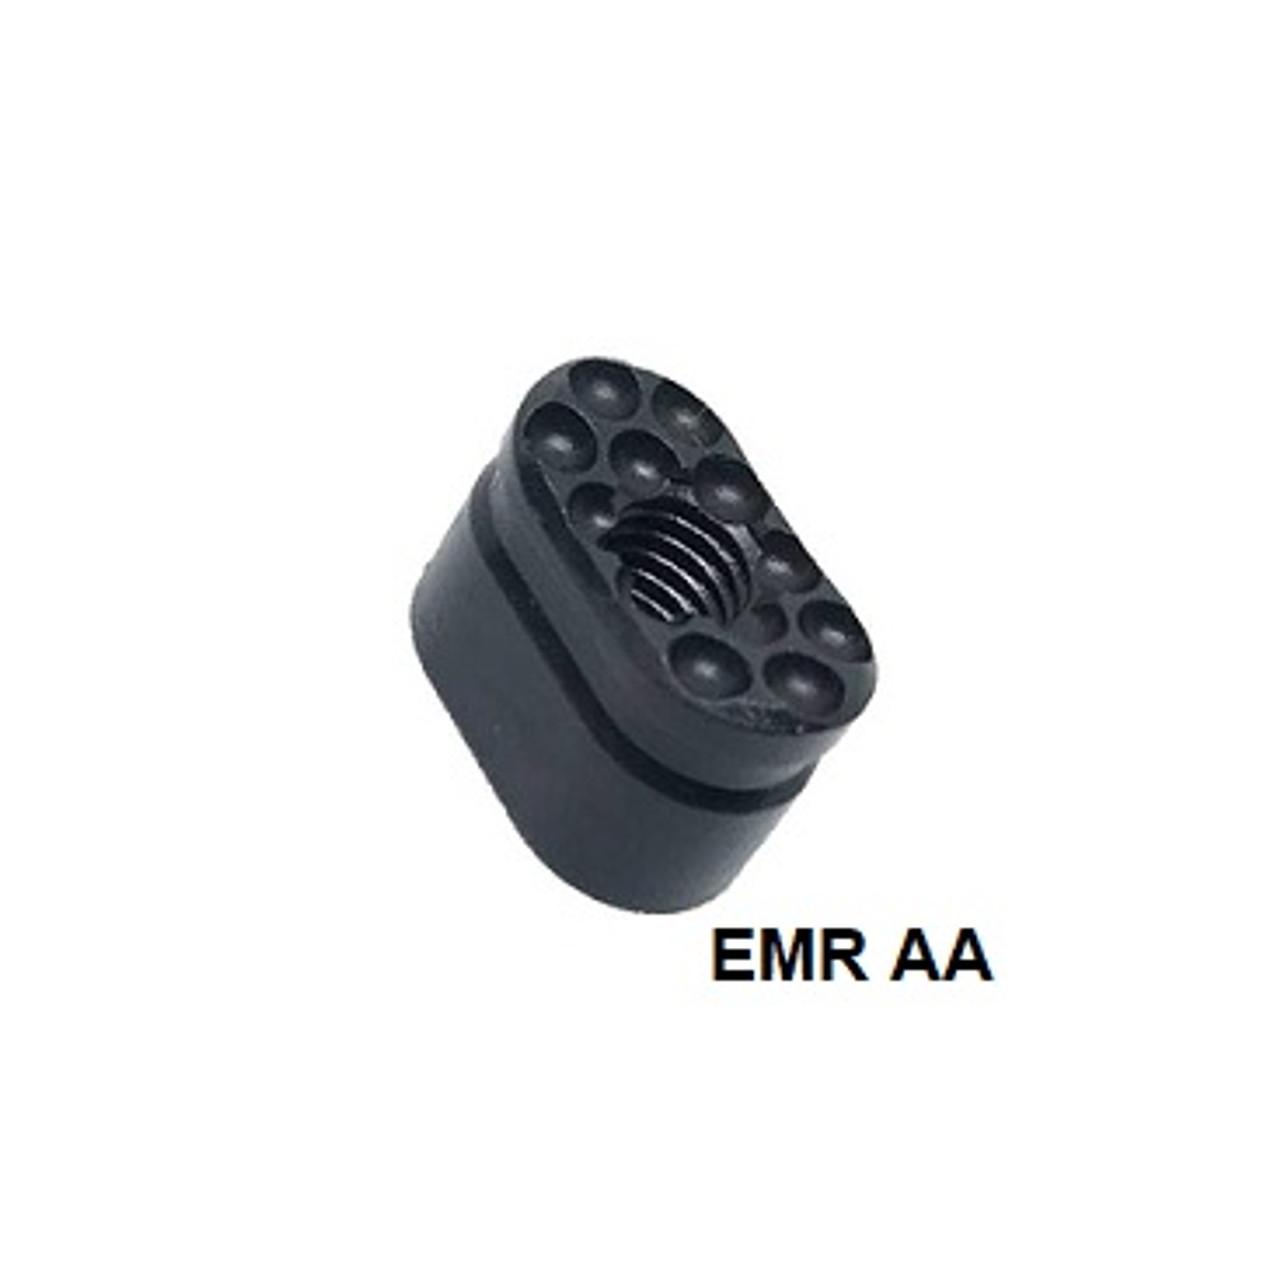 Forward Controls Design Enhanced Magazine Release - EMR AA